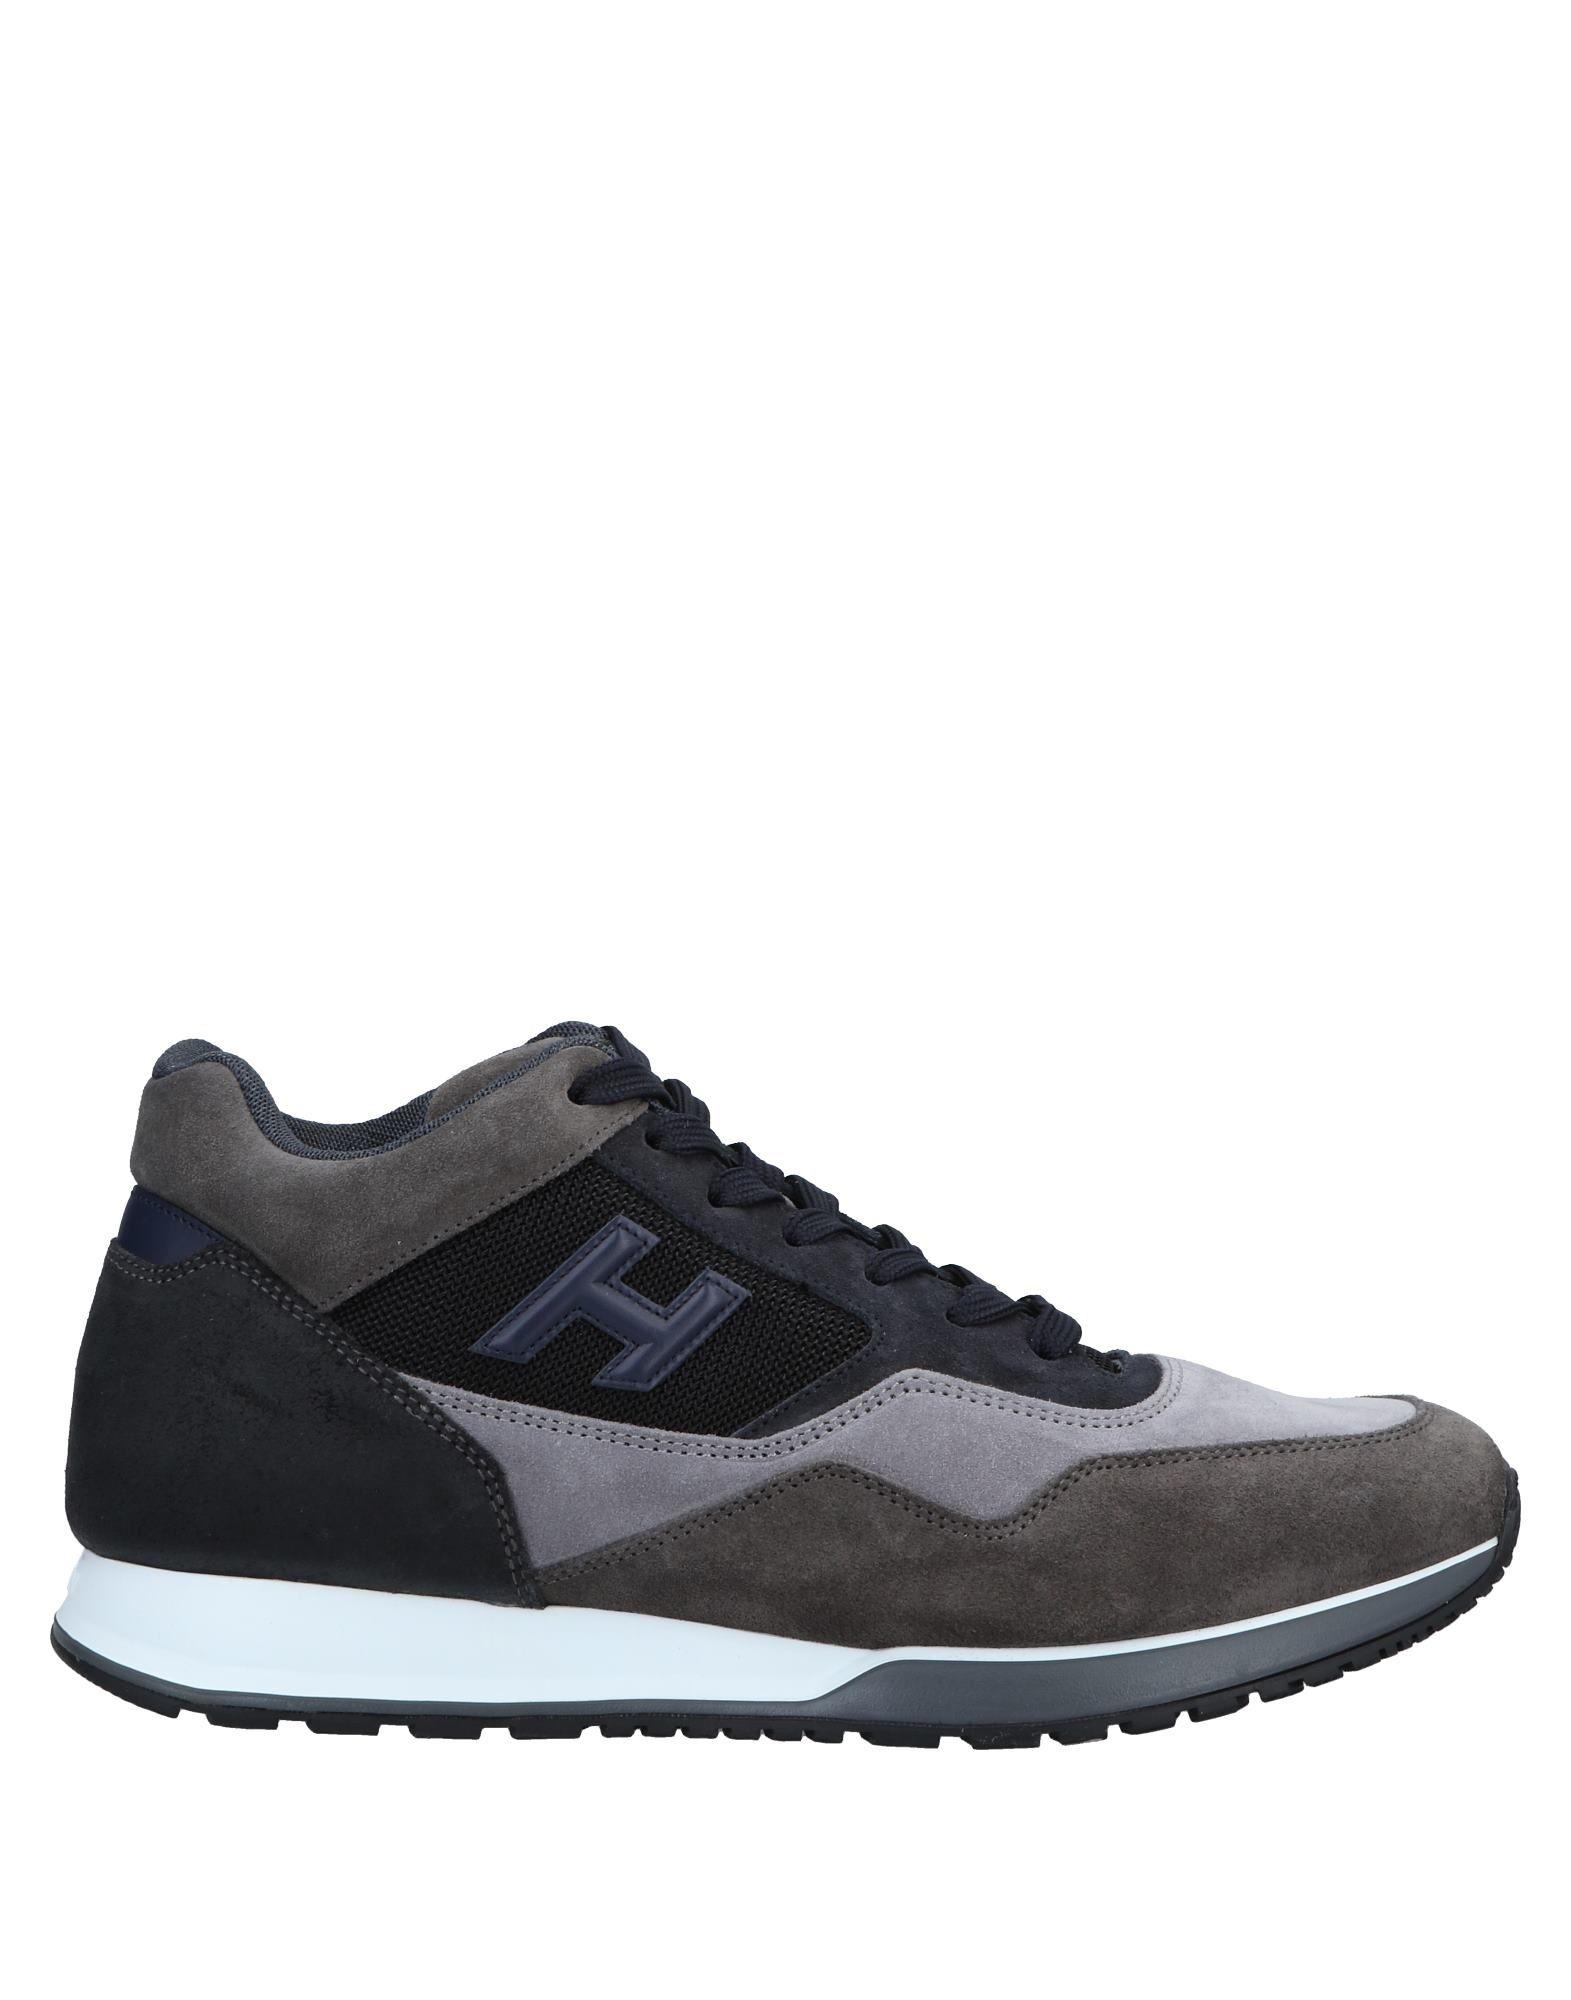 Hogan Sneakers Herren  11559792US Gute Qualität beliebte Schuhe